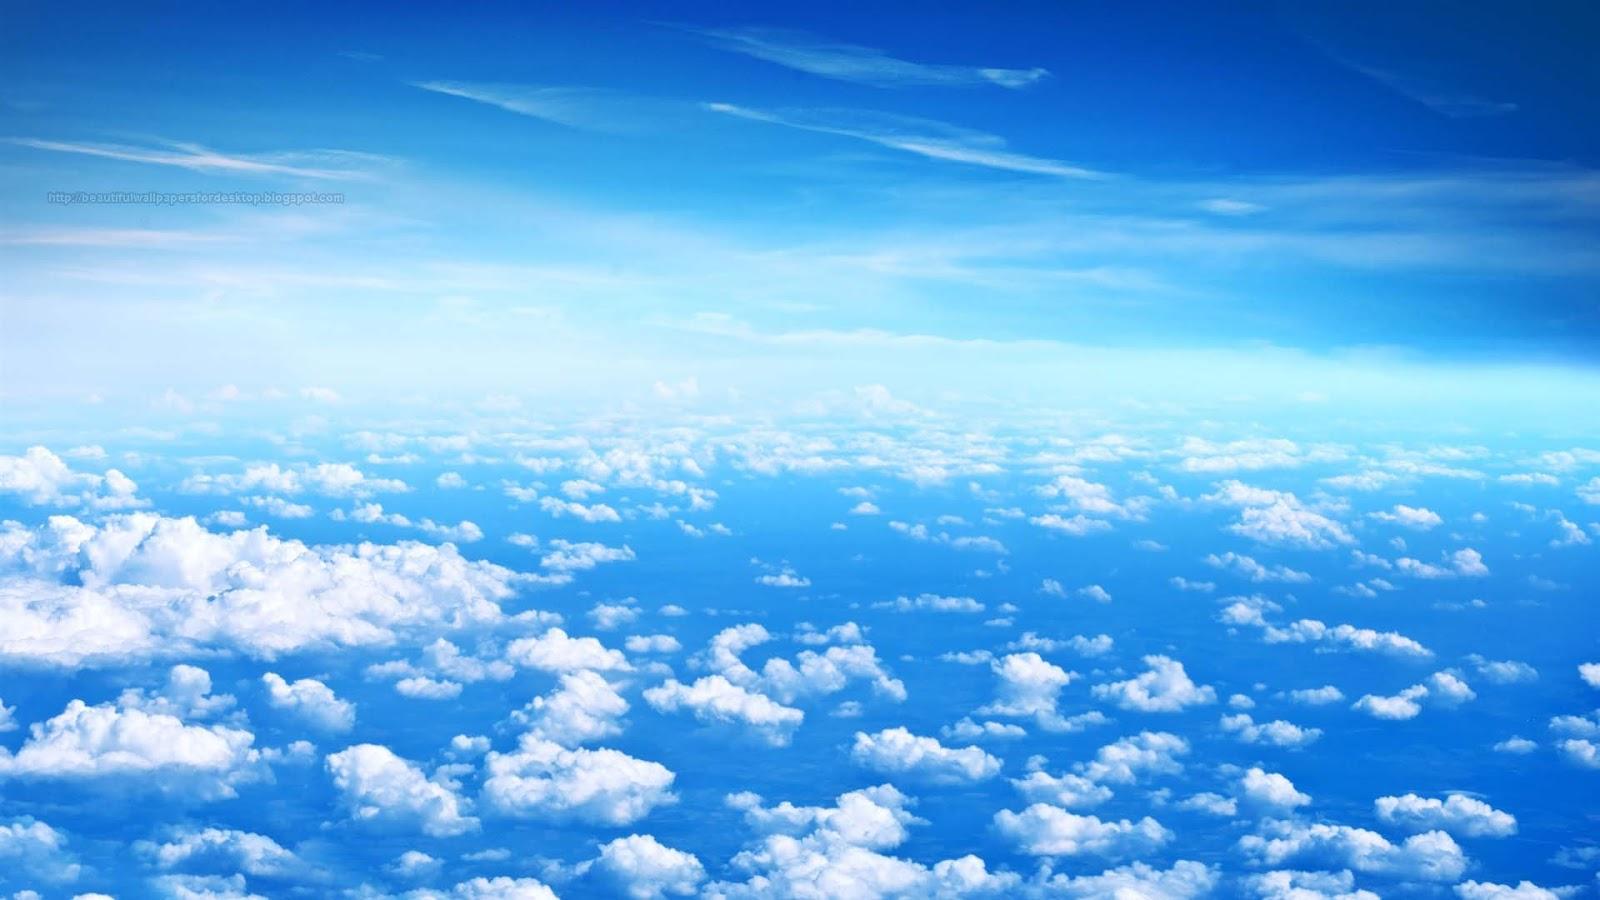 sky wallpaper for desktop - photo #28